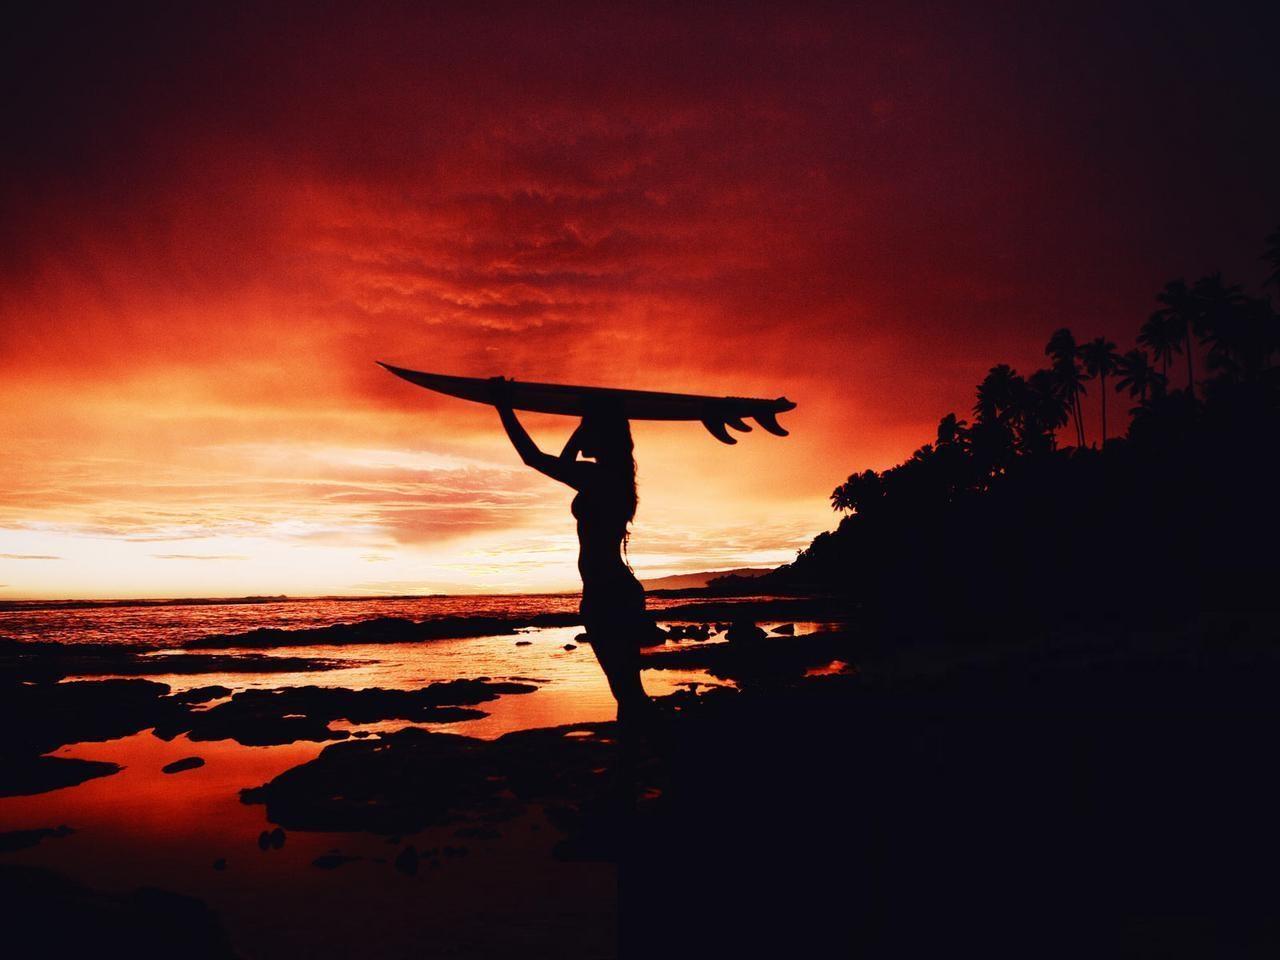 surfing sunset wallpaper